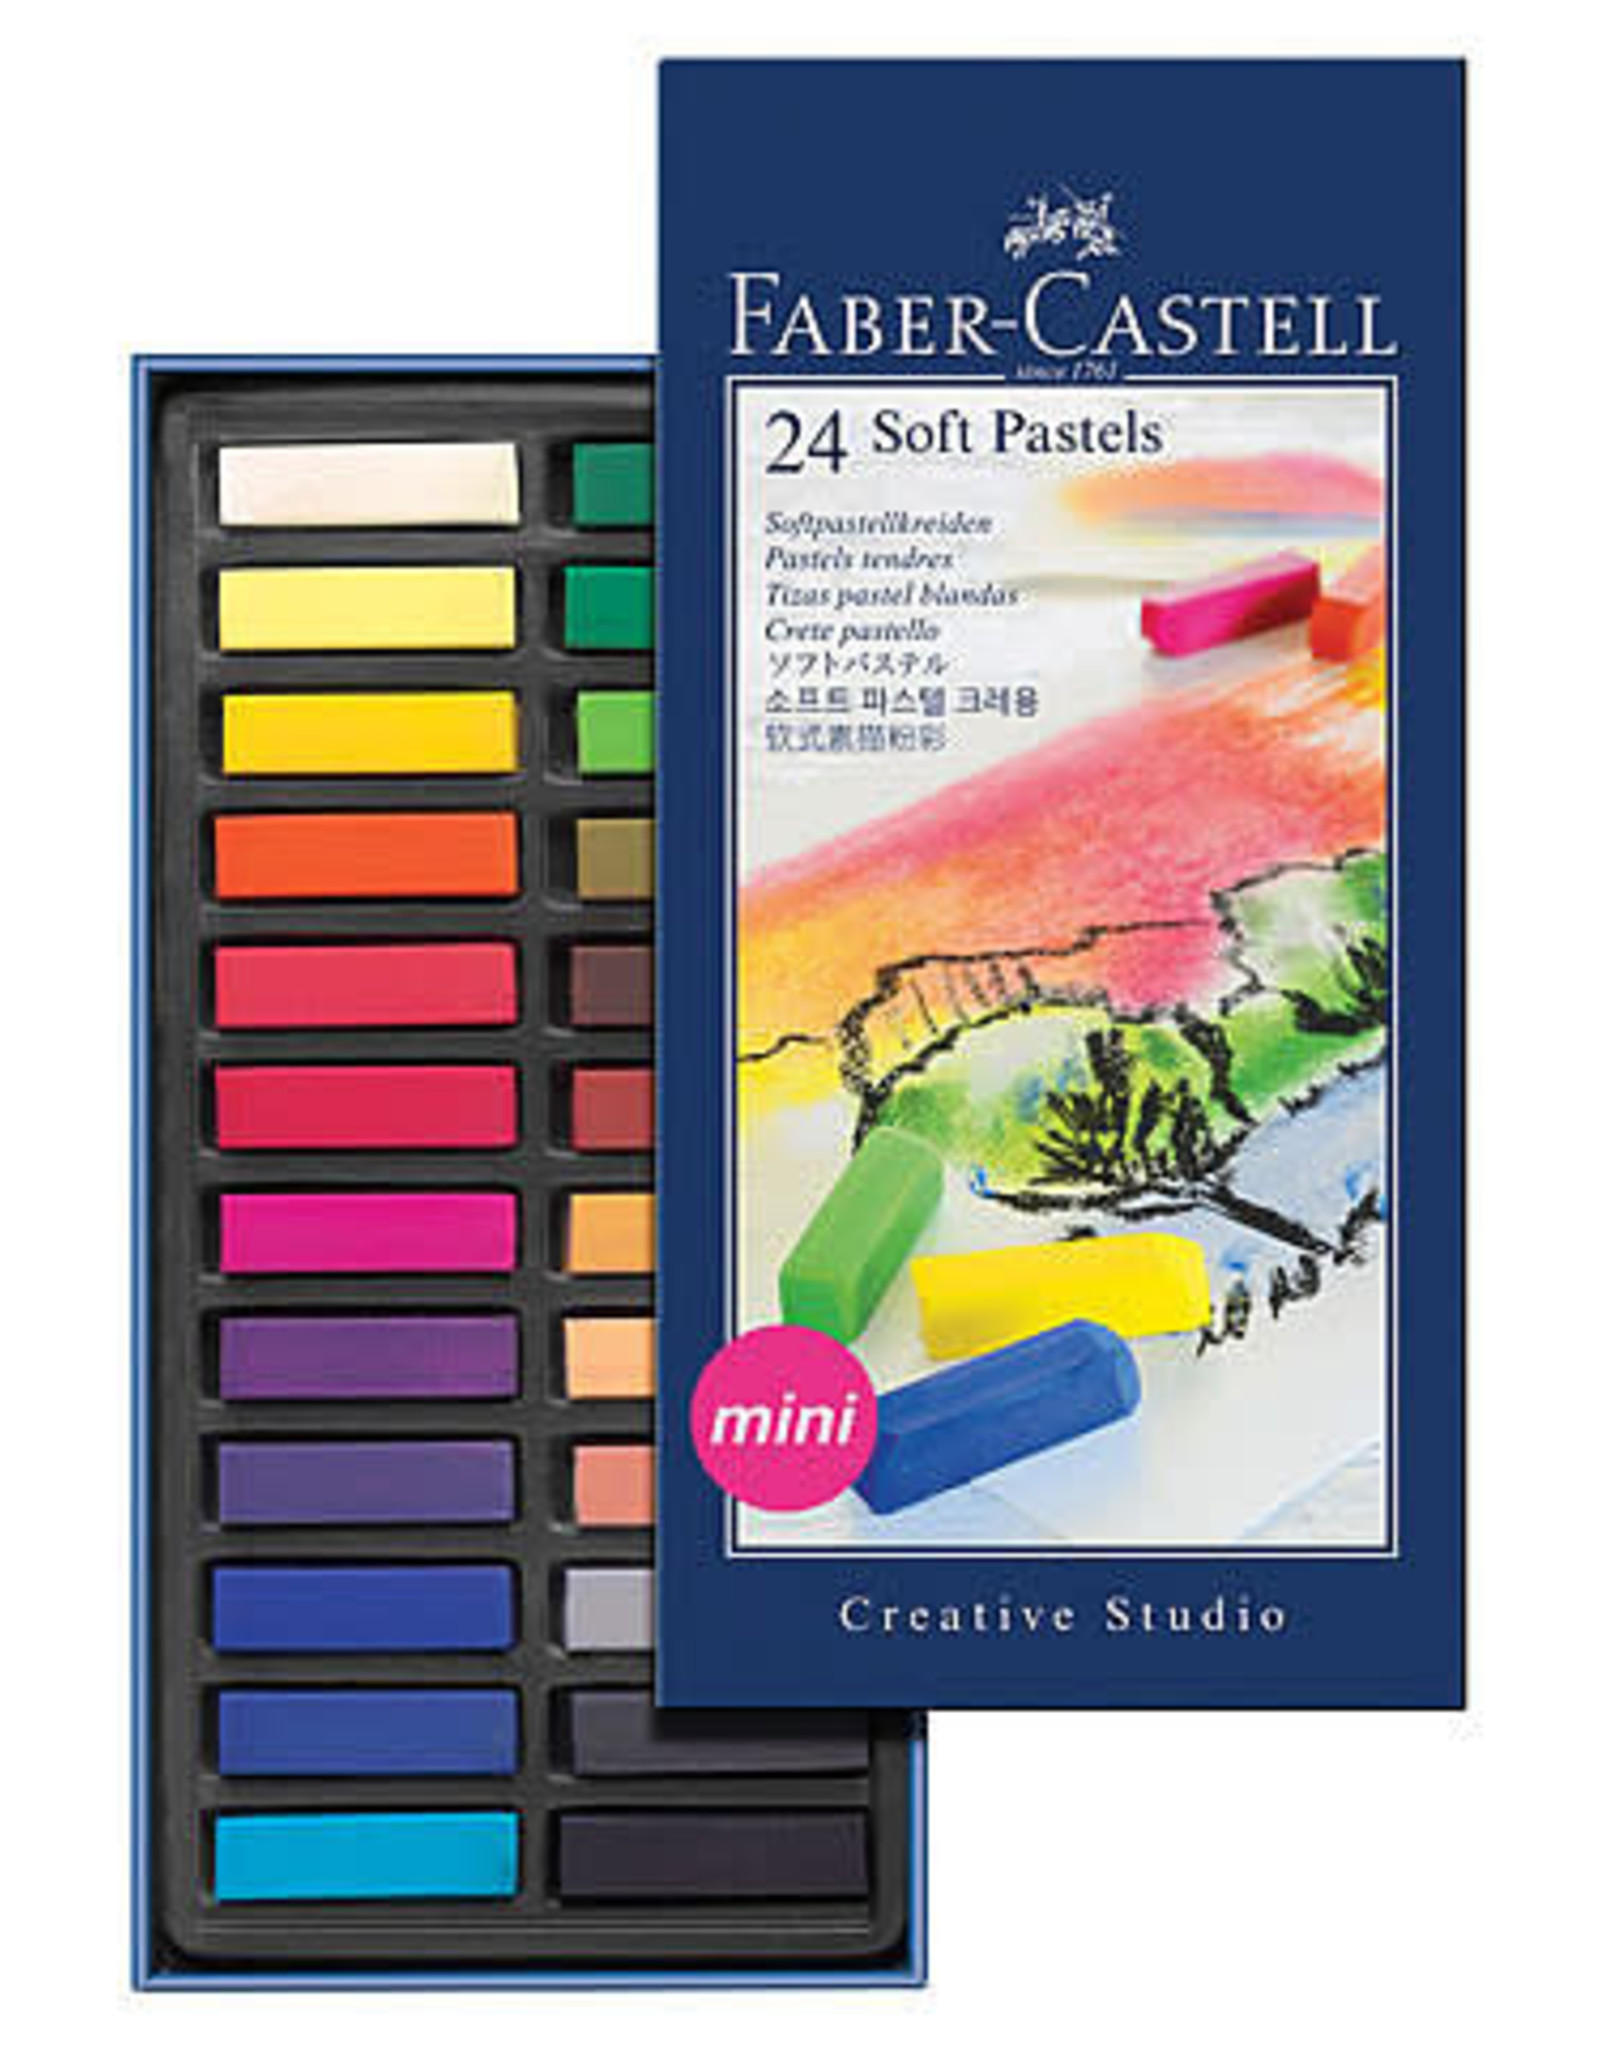 Faber-Castell Creative Studio Soft Chalk Pastel Sets